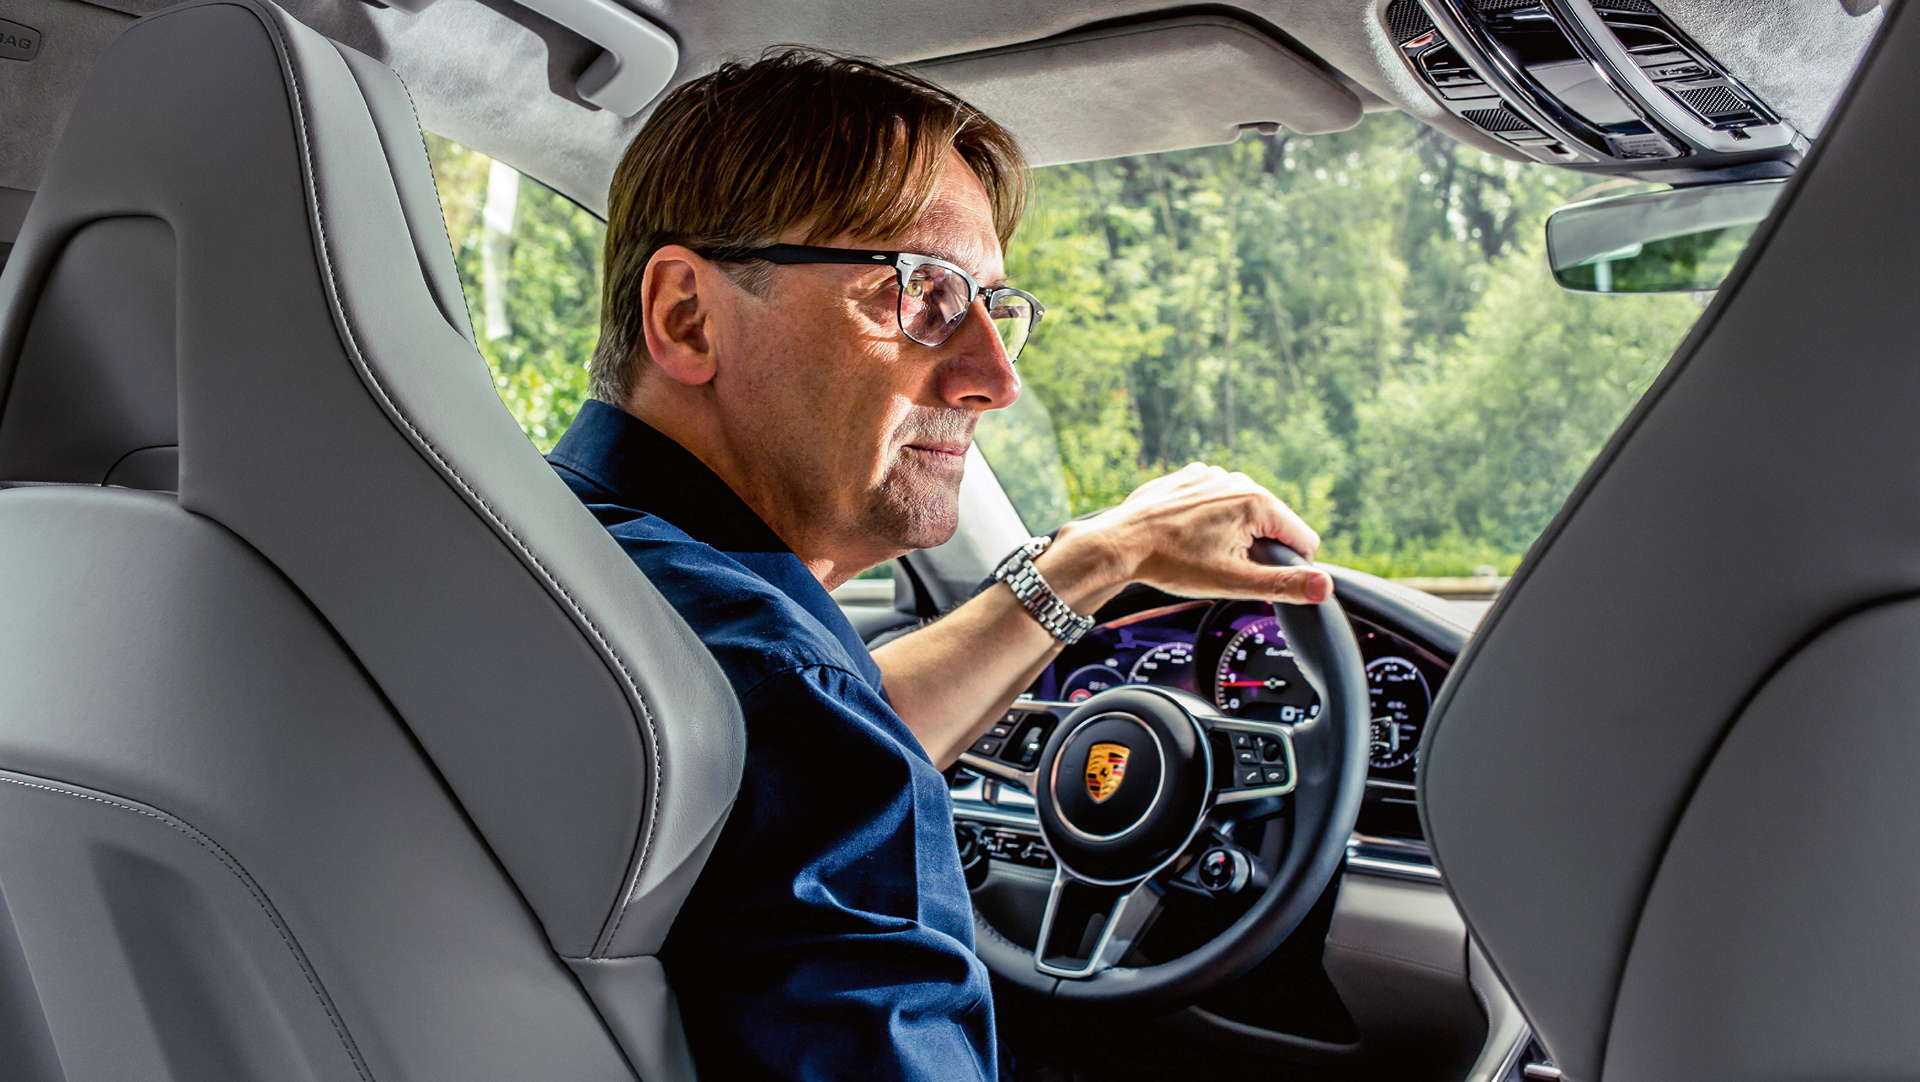 Thomas Fuths © Dr. Ing. h.c. F. Porsche AG